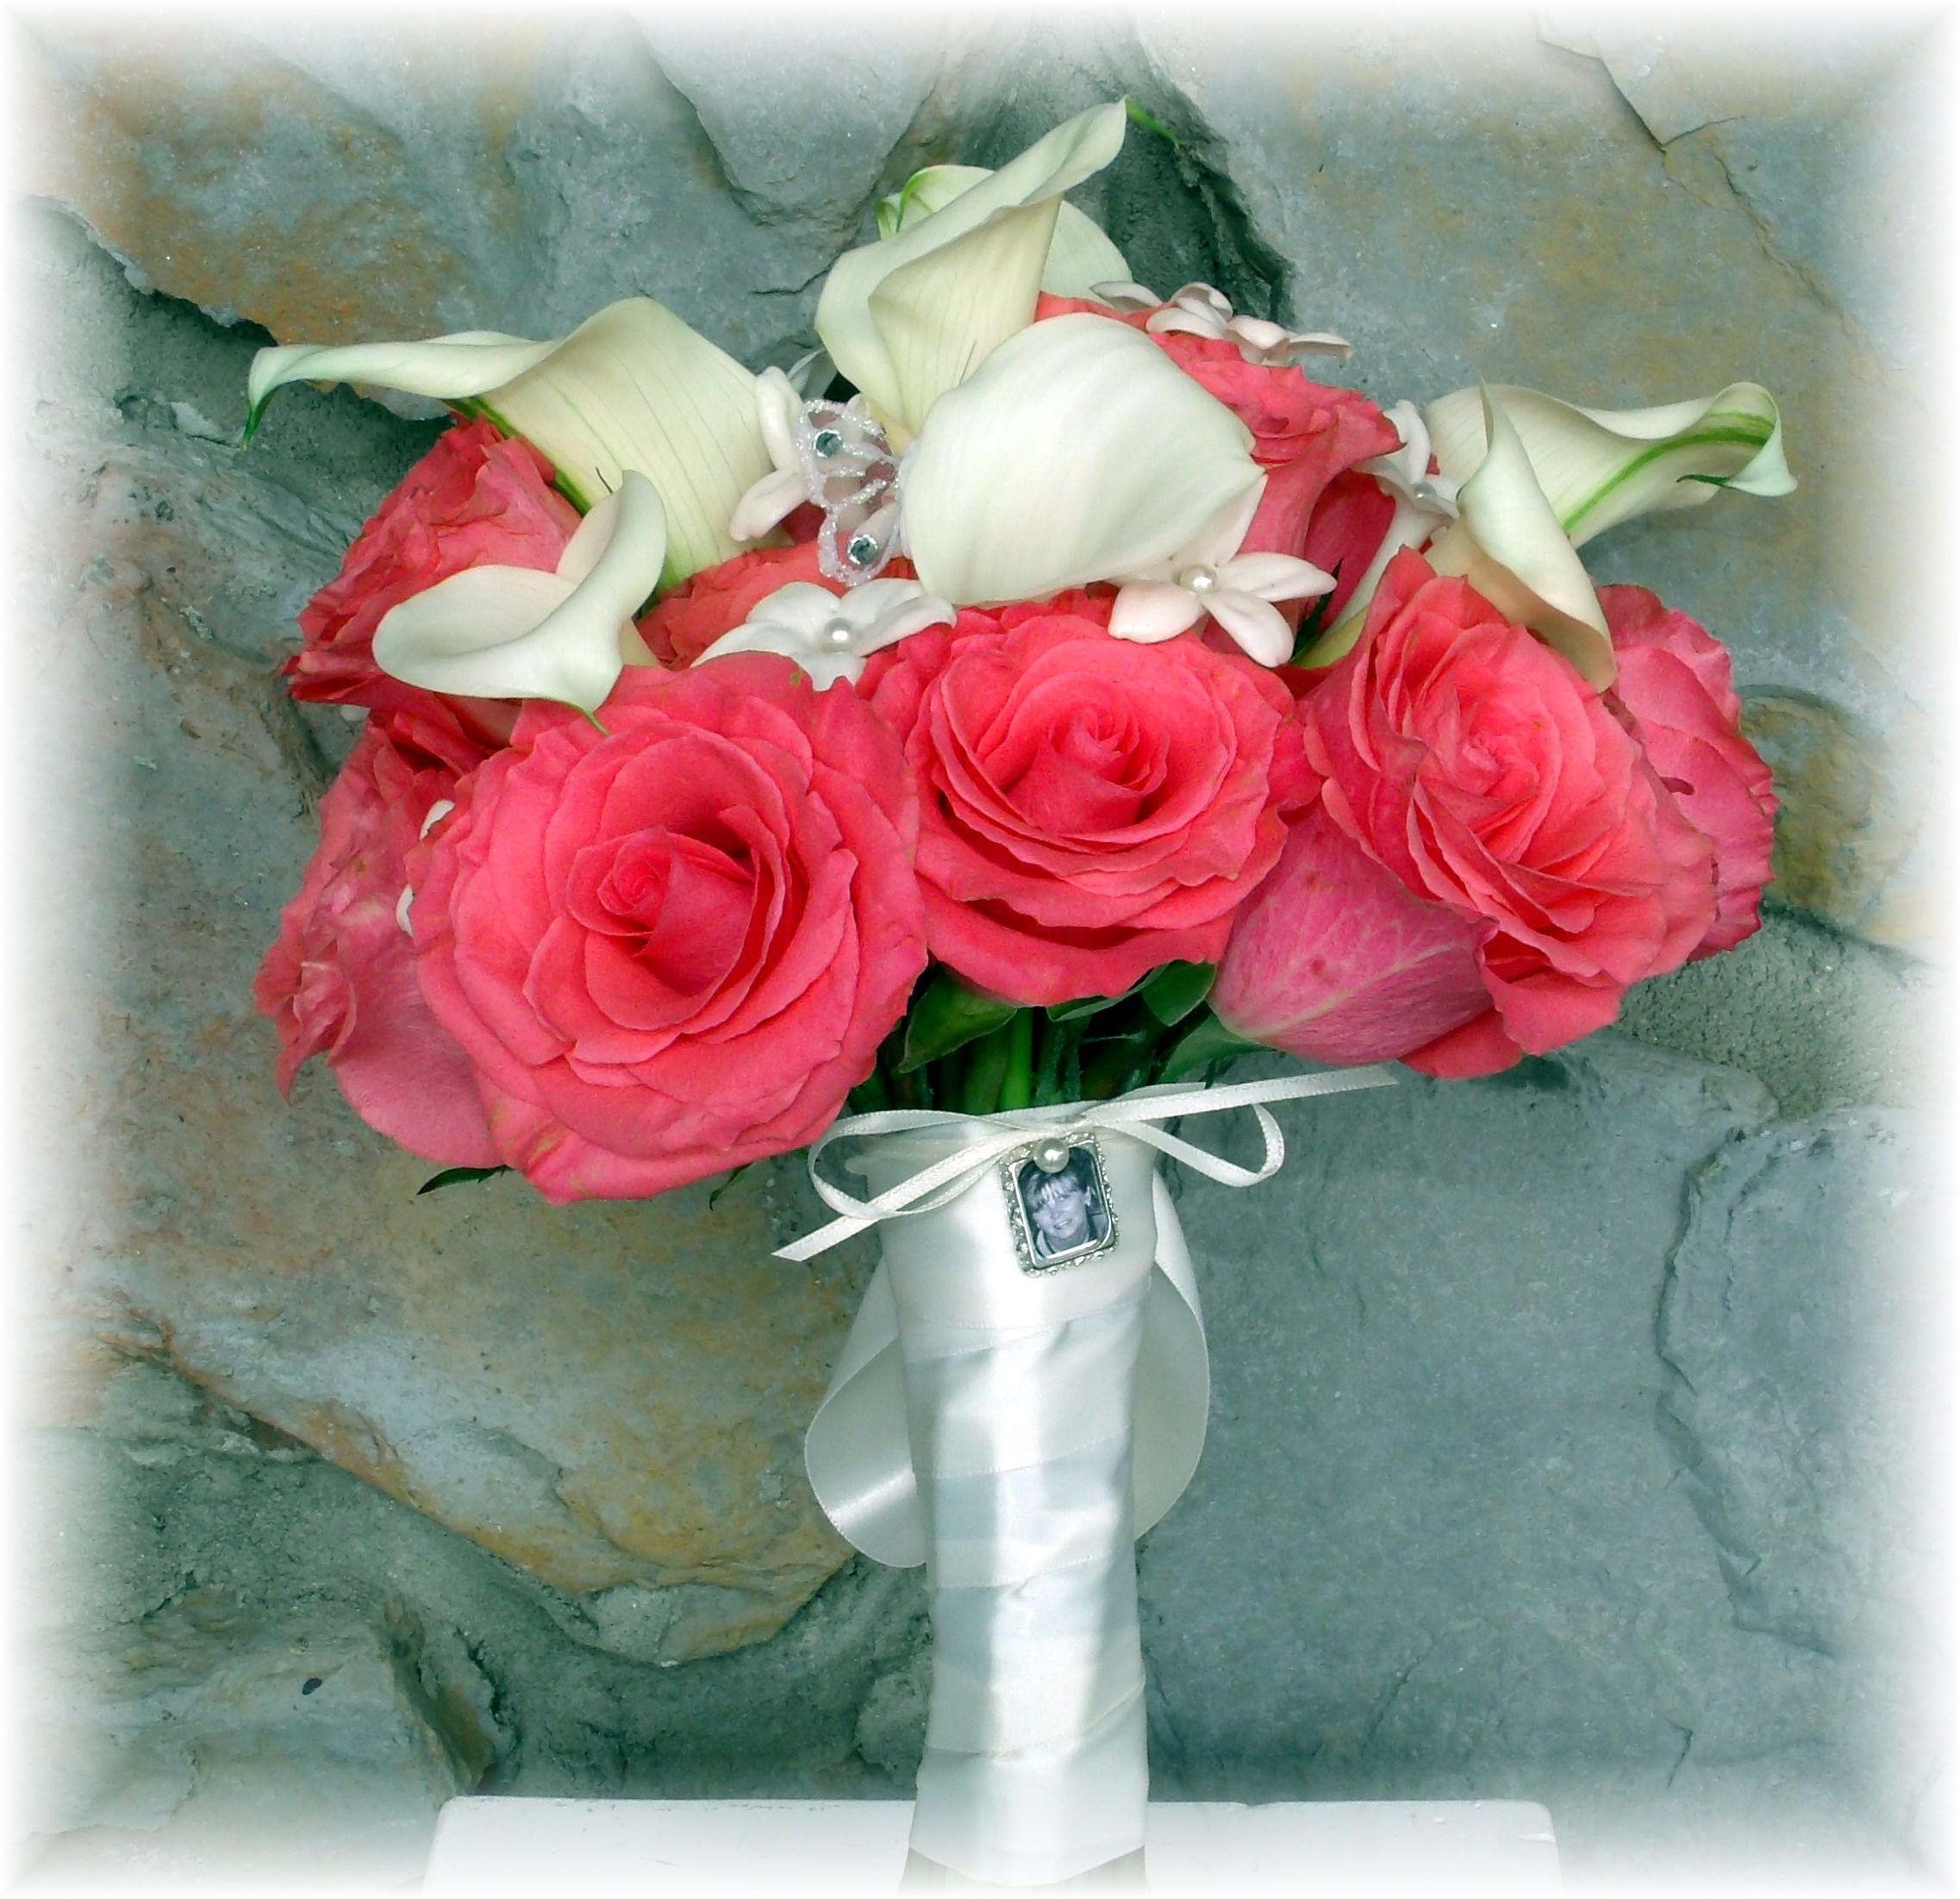 Roses, Calla lilies & Stephanotis